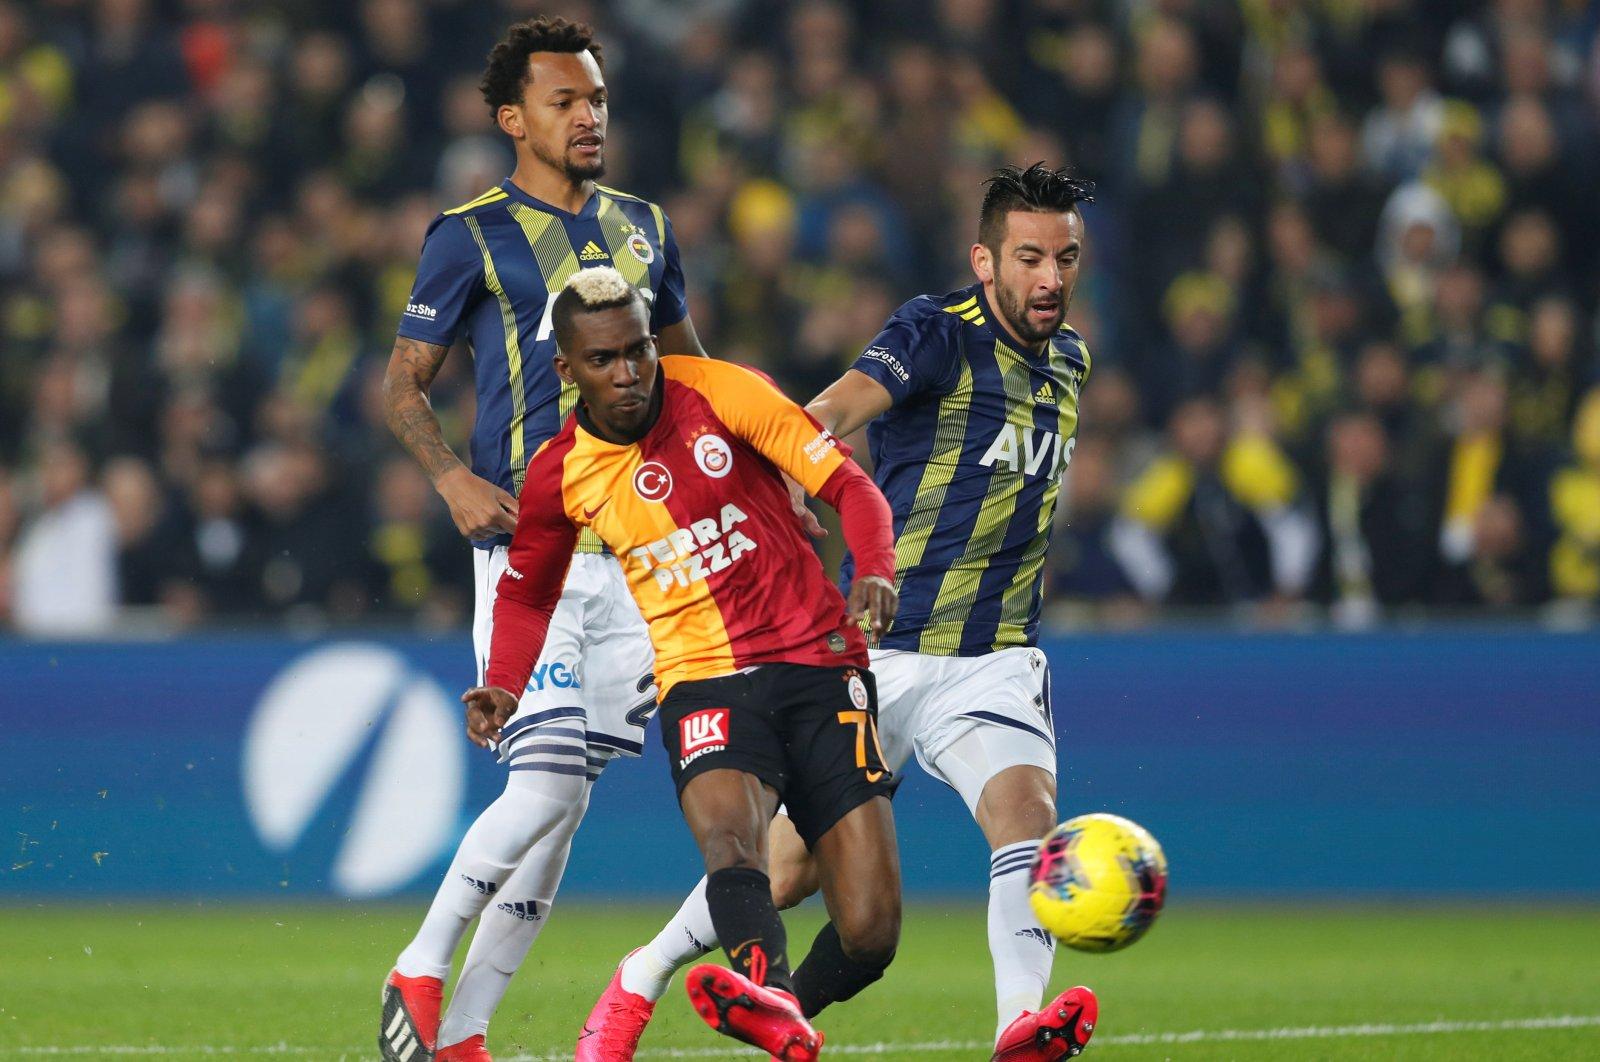 Football - Super Lig - Fenerbahçe vs Galatasaray - Şükrü Saraçoğlu Stadium, Istanbul, February 23, 2020. (REUTERS Photo)